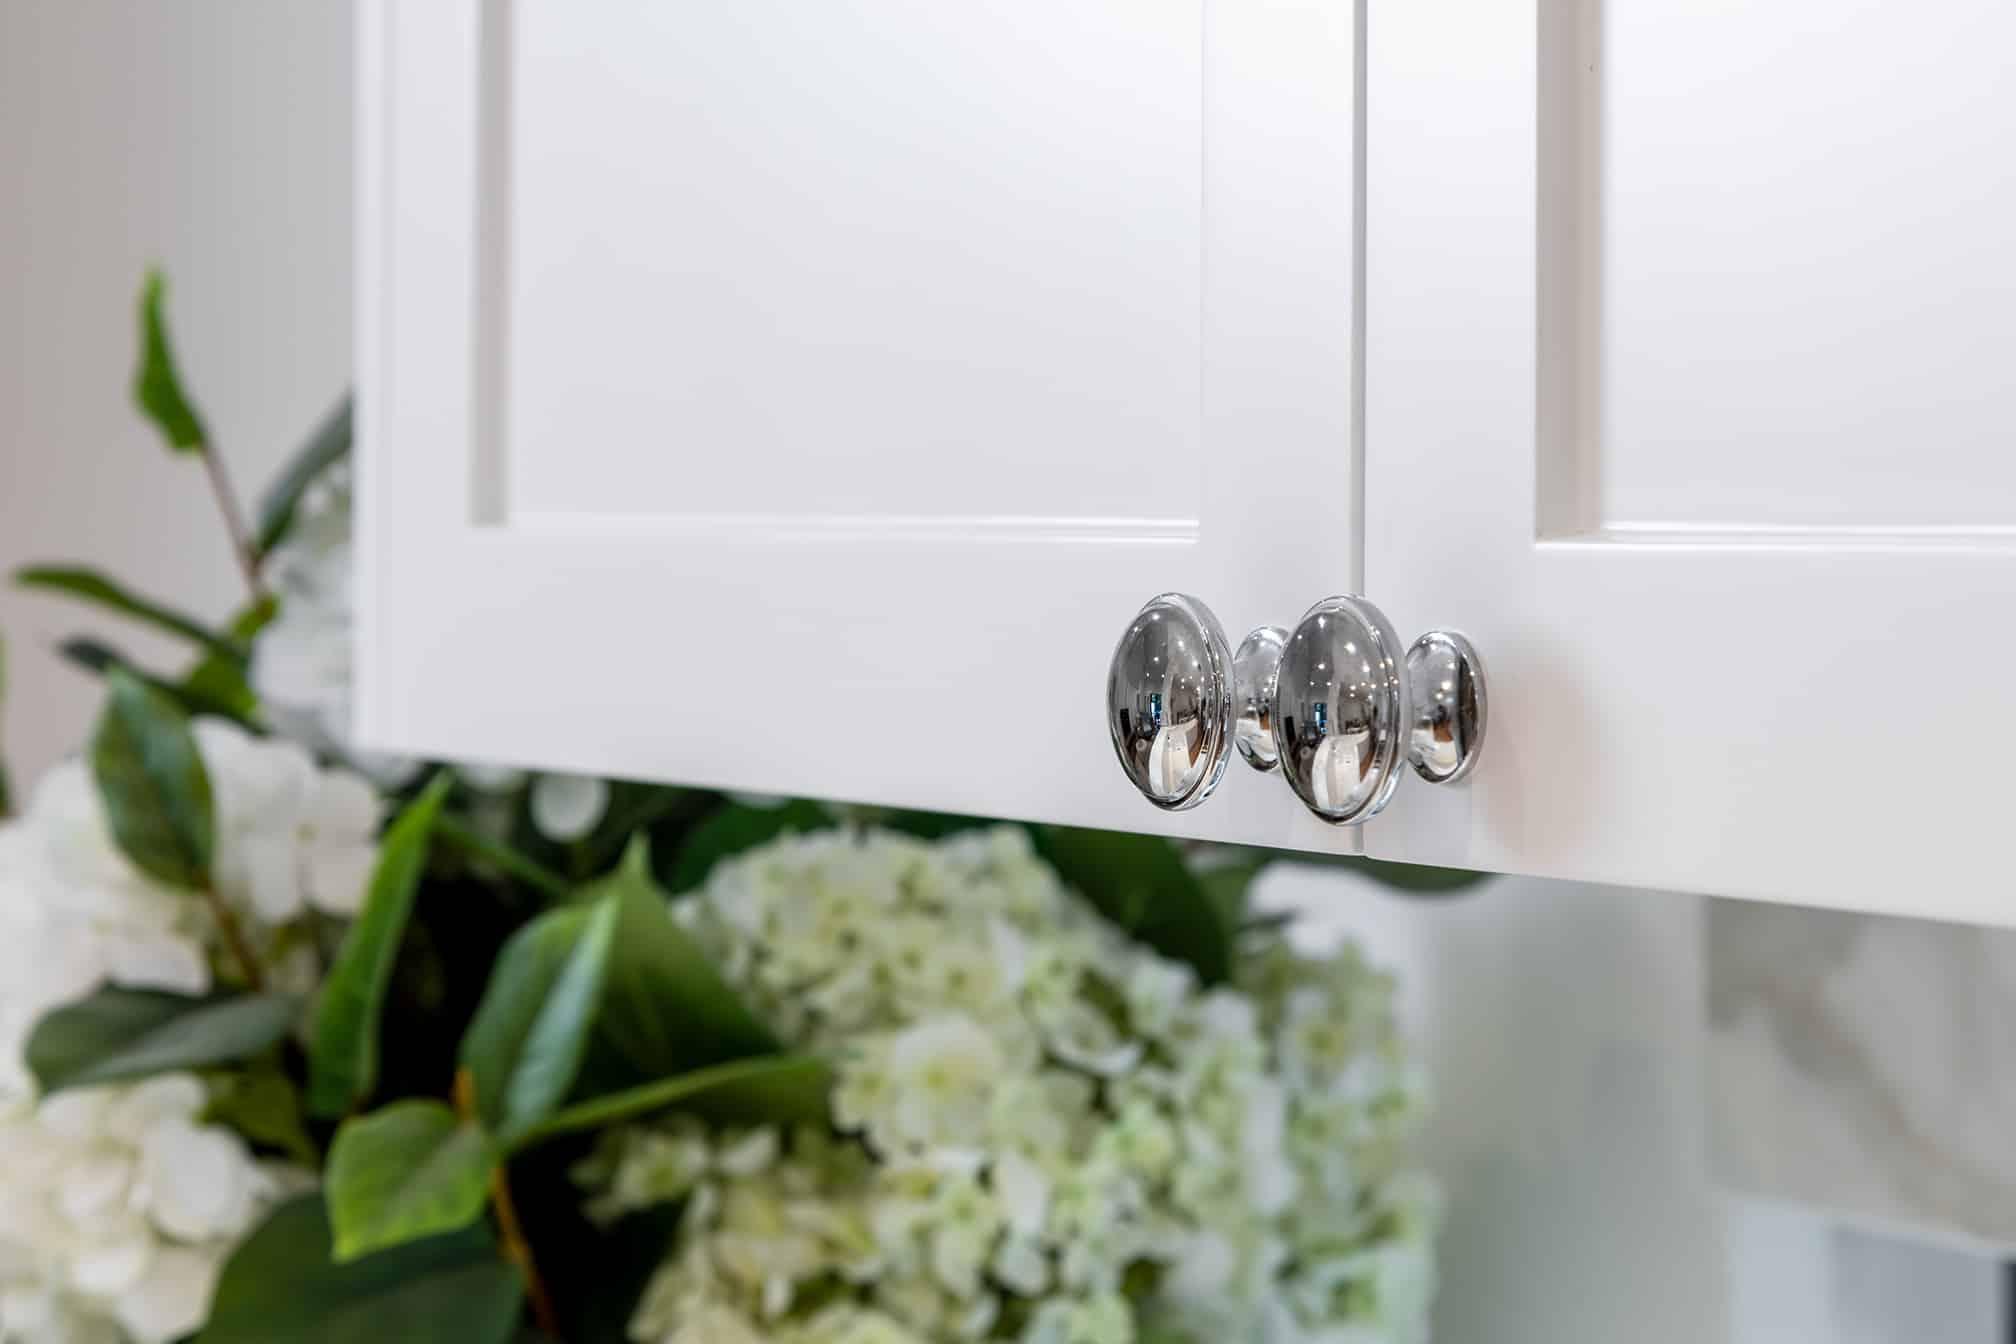 Joondanna Hamptons Kitchen cabinetry and handles